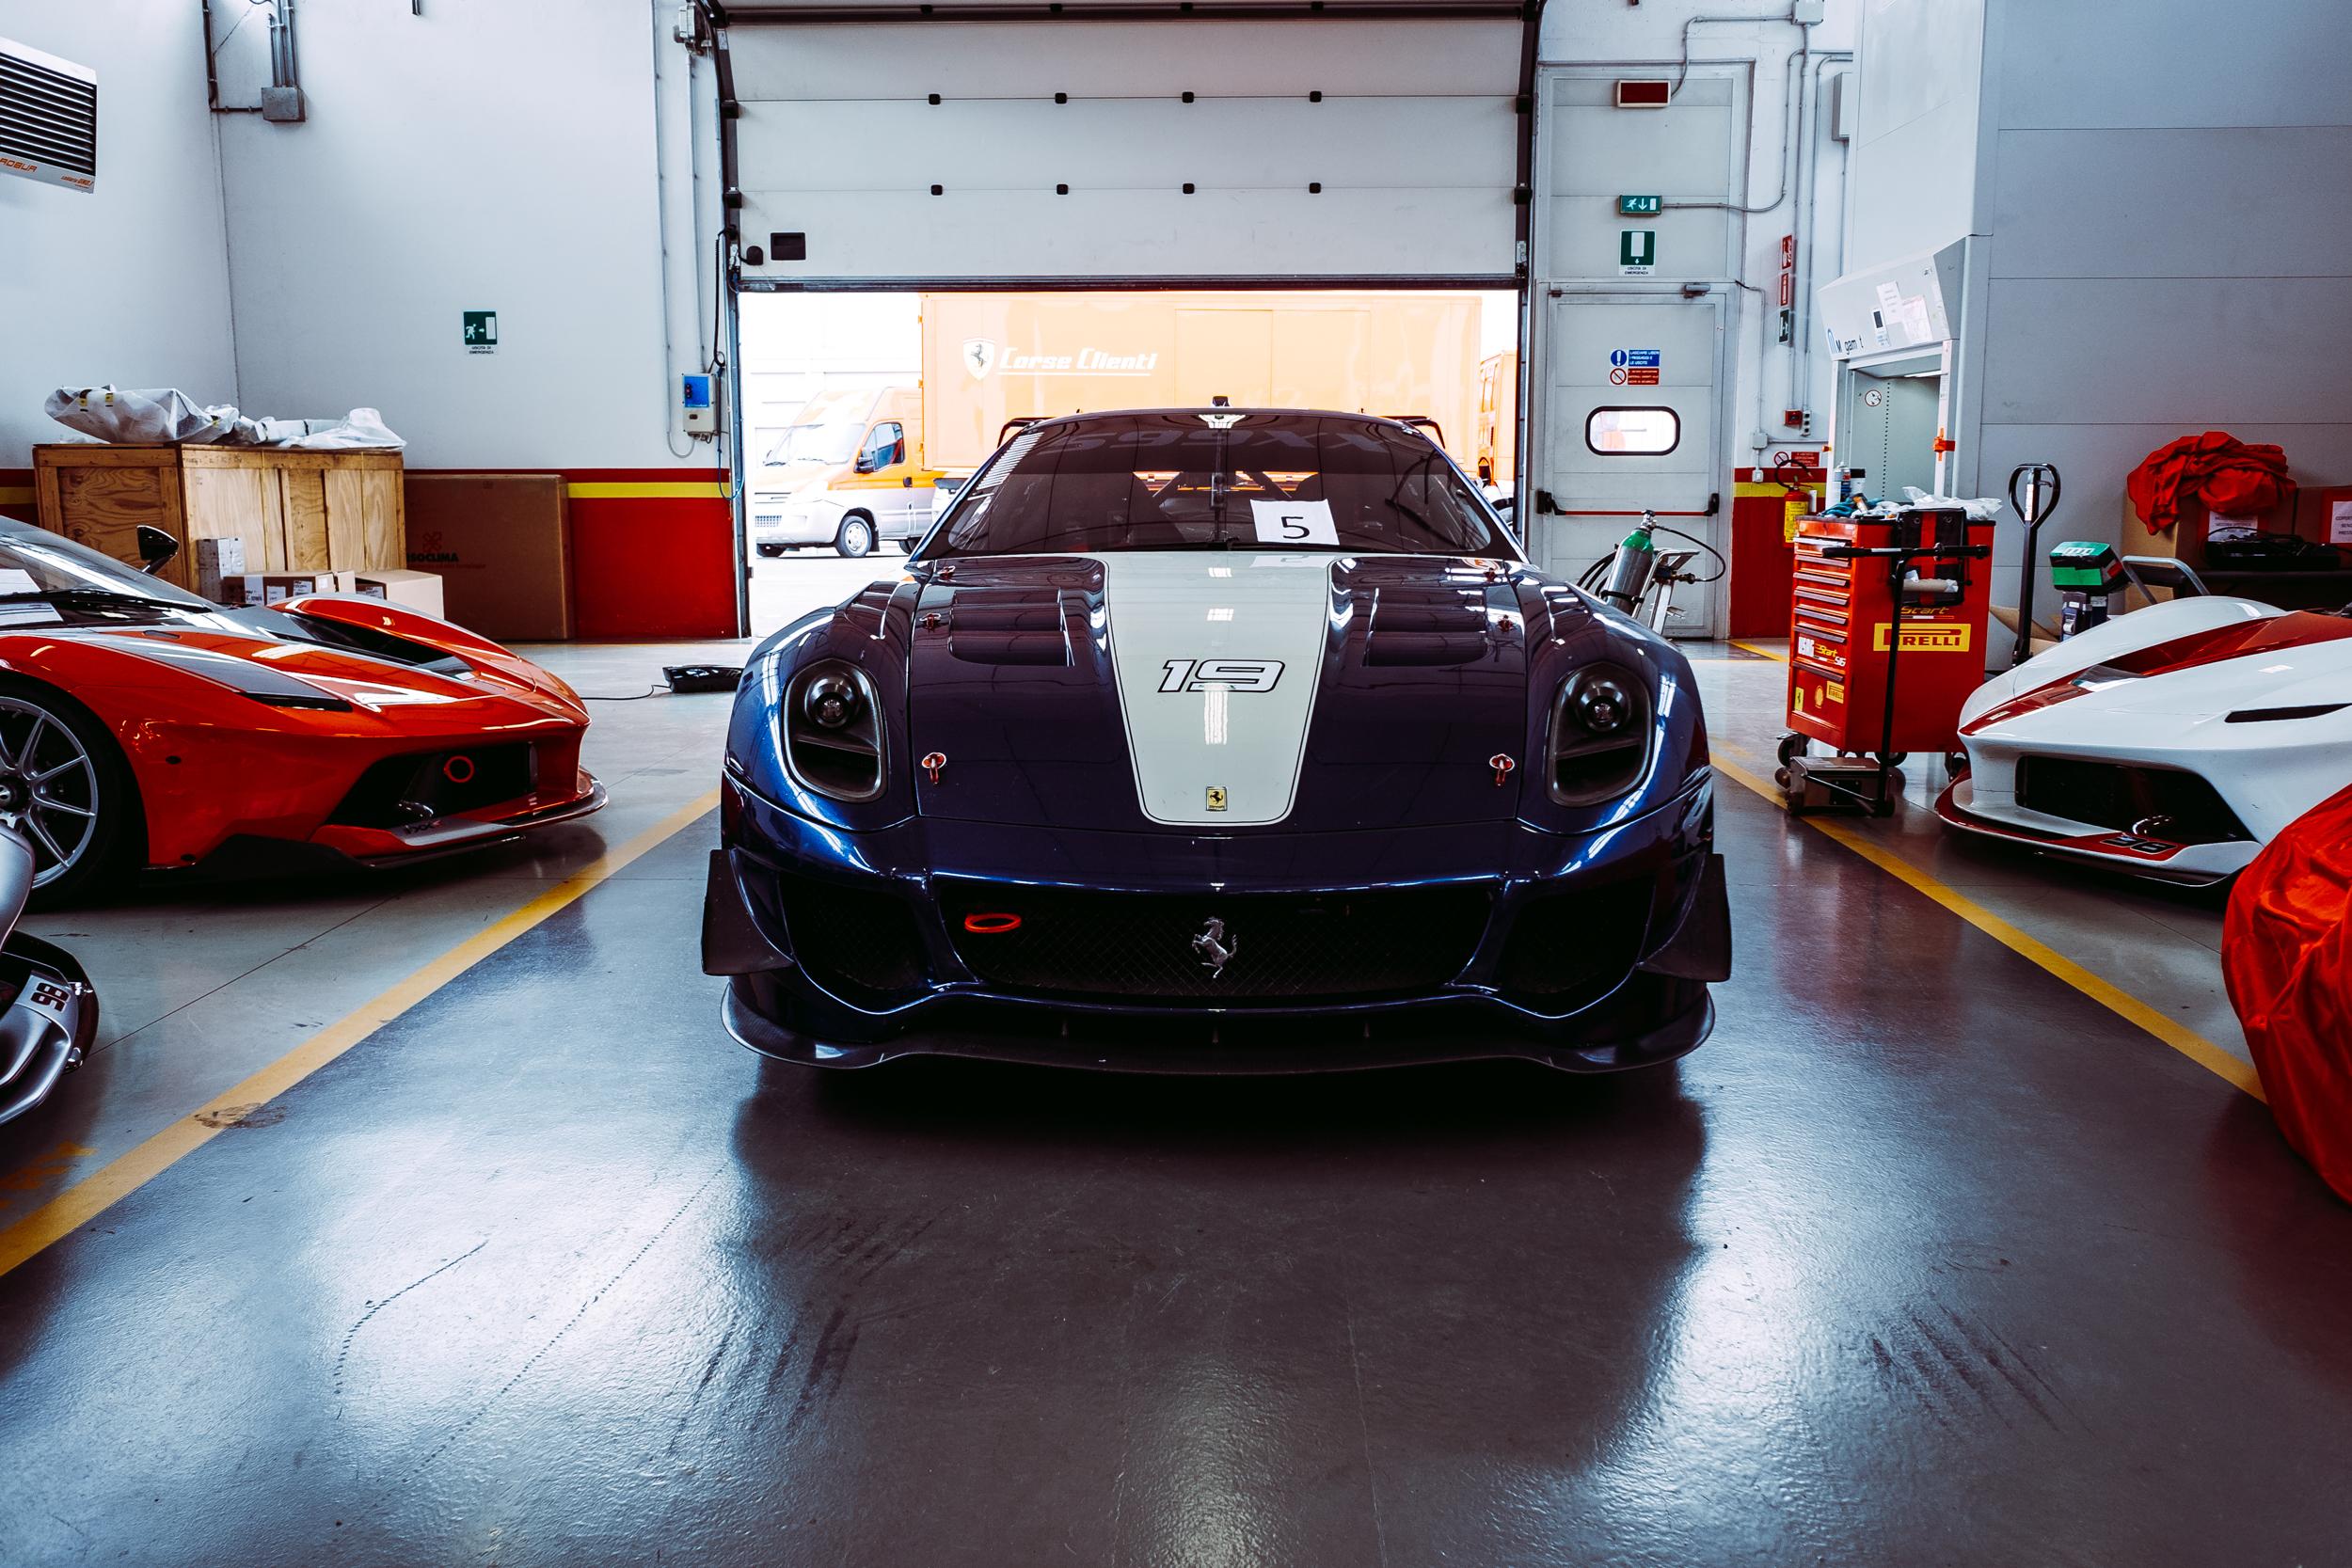 Ferrari-3358.jpg